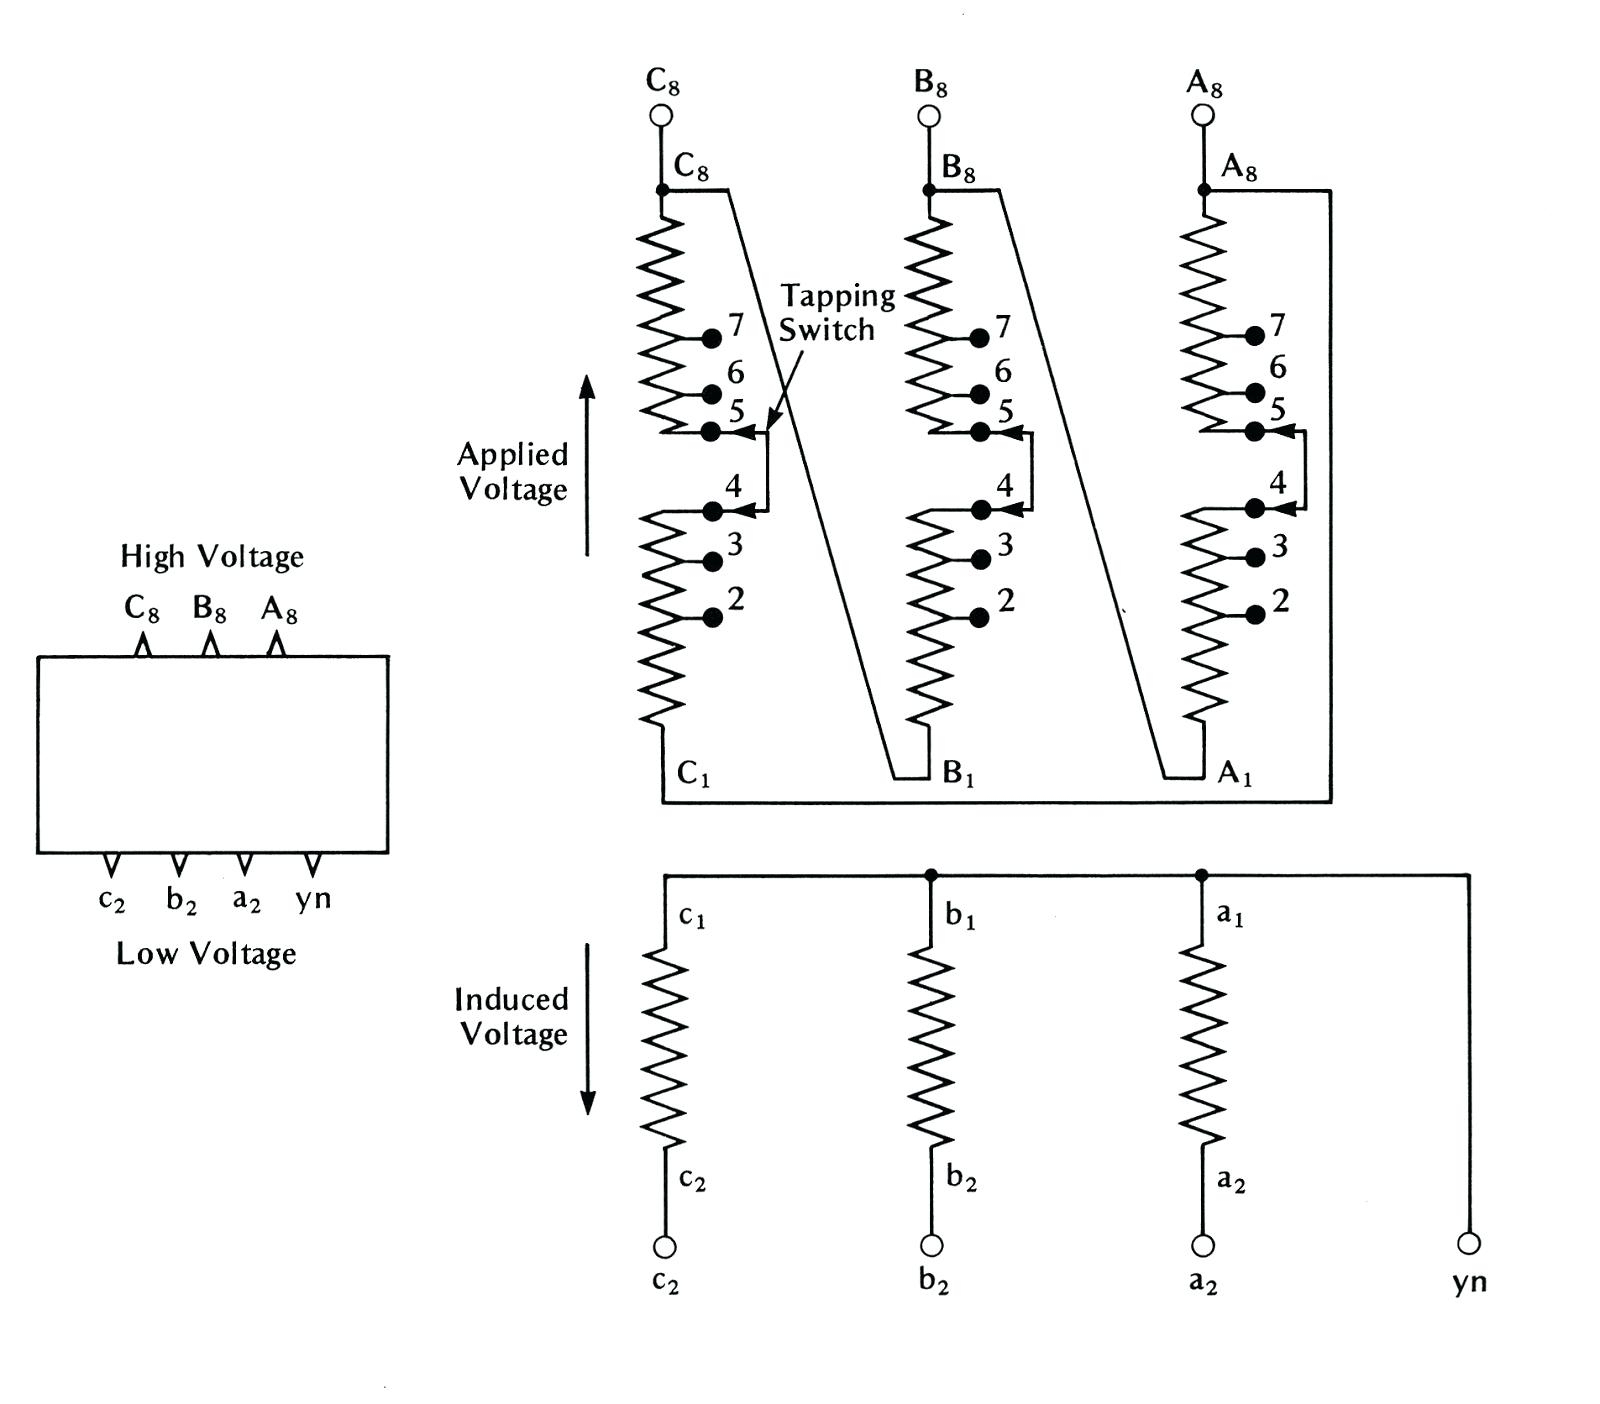 Single Phase Transformer Wiring Diagram Symbols For Three